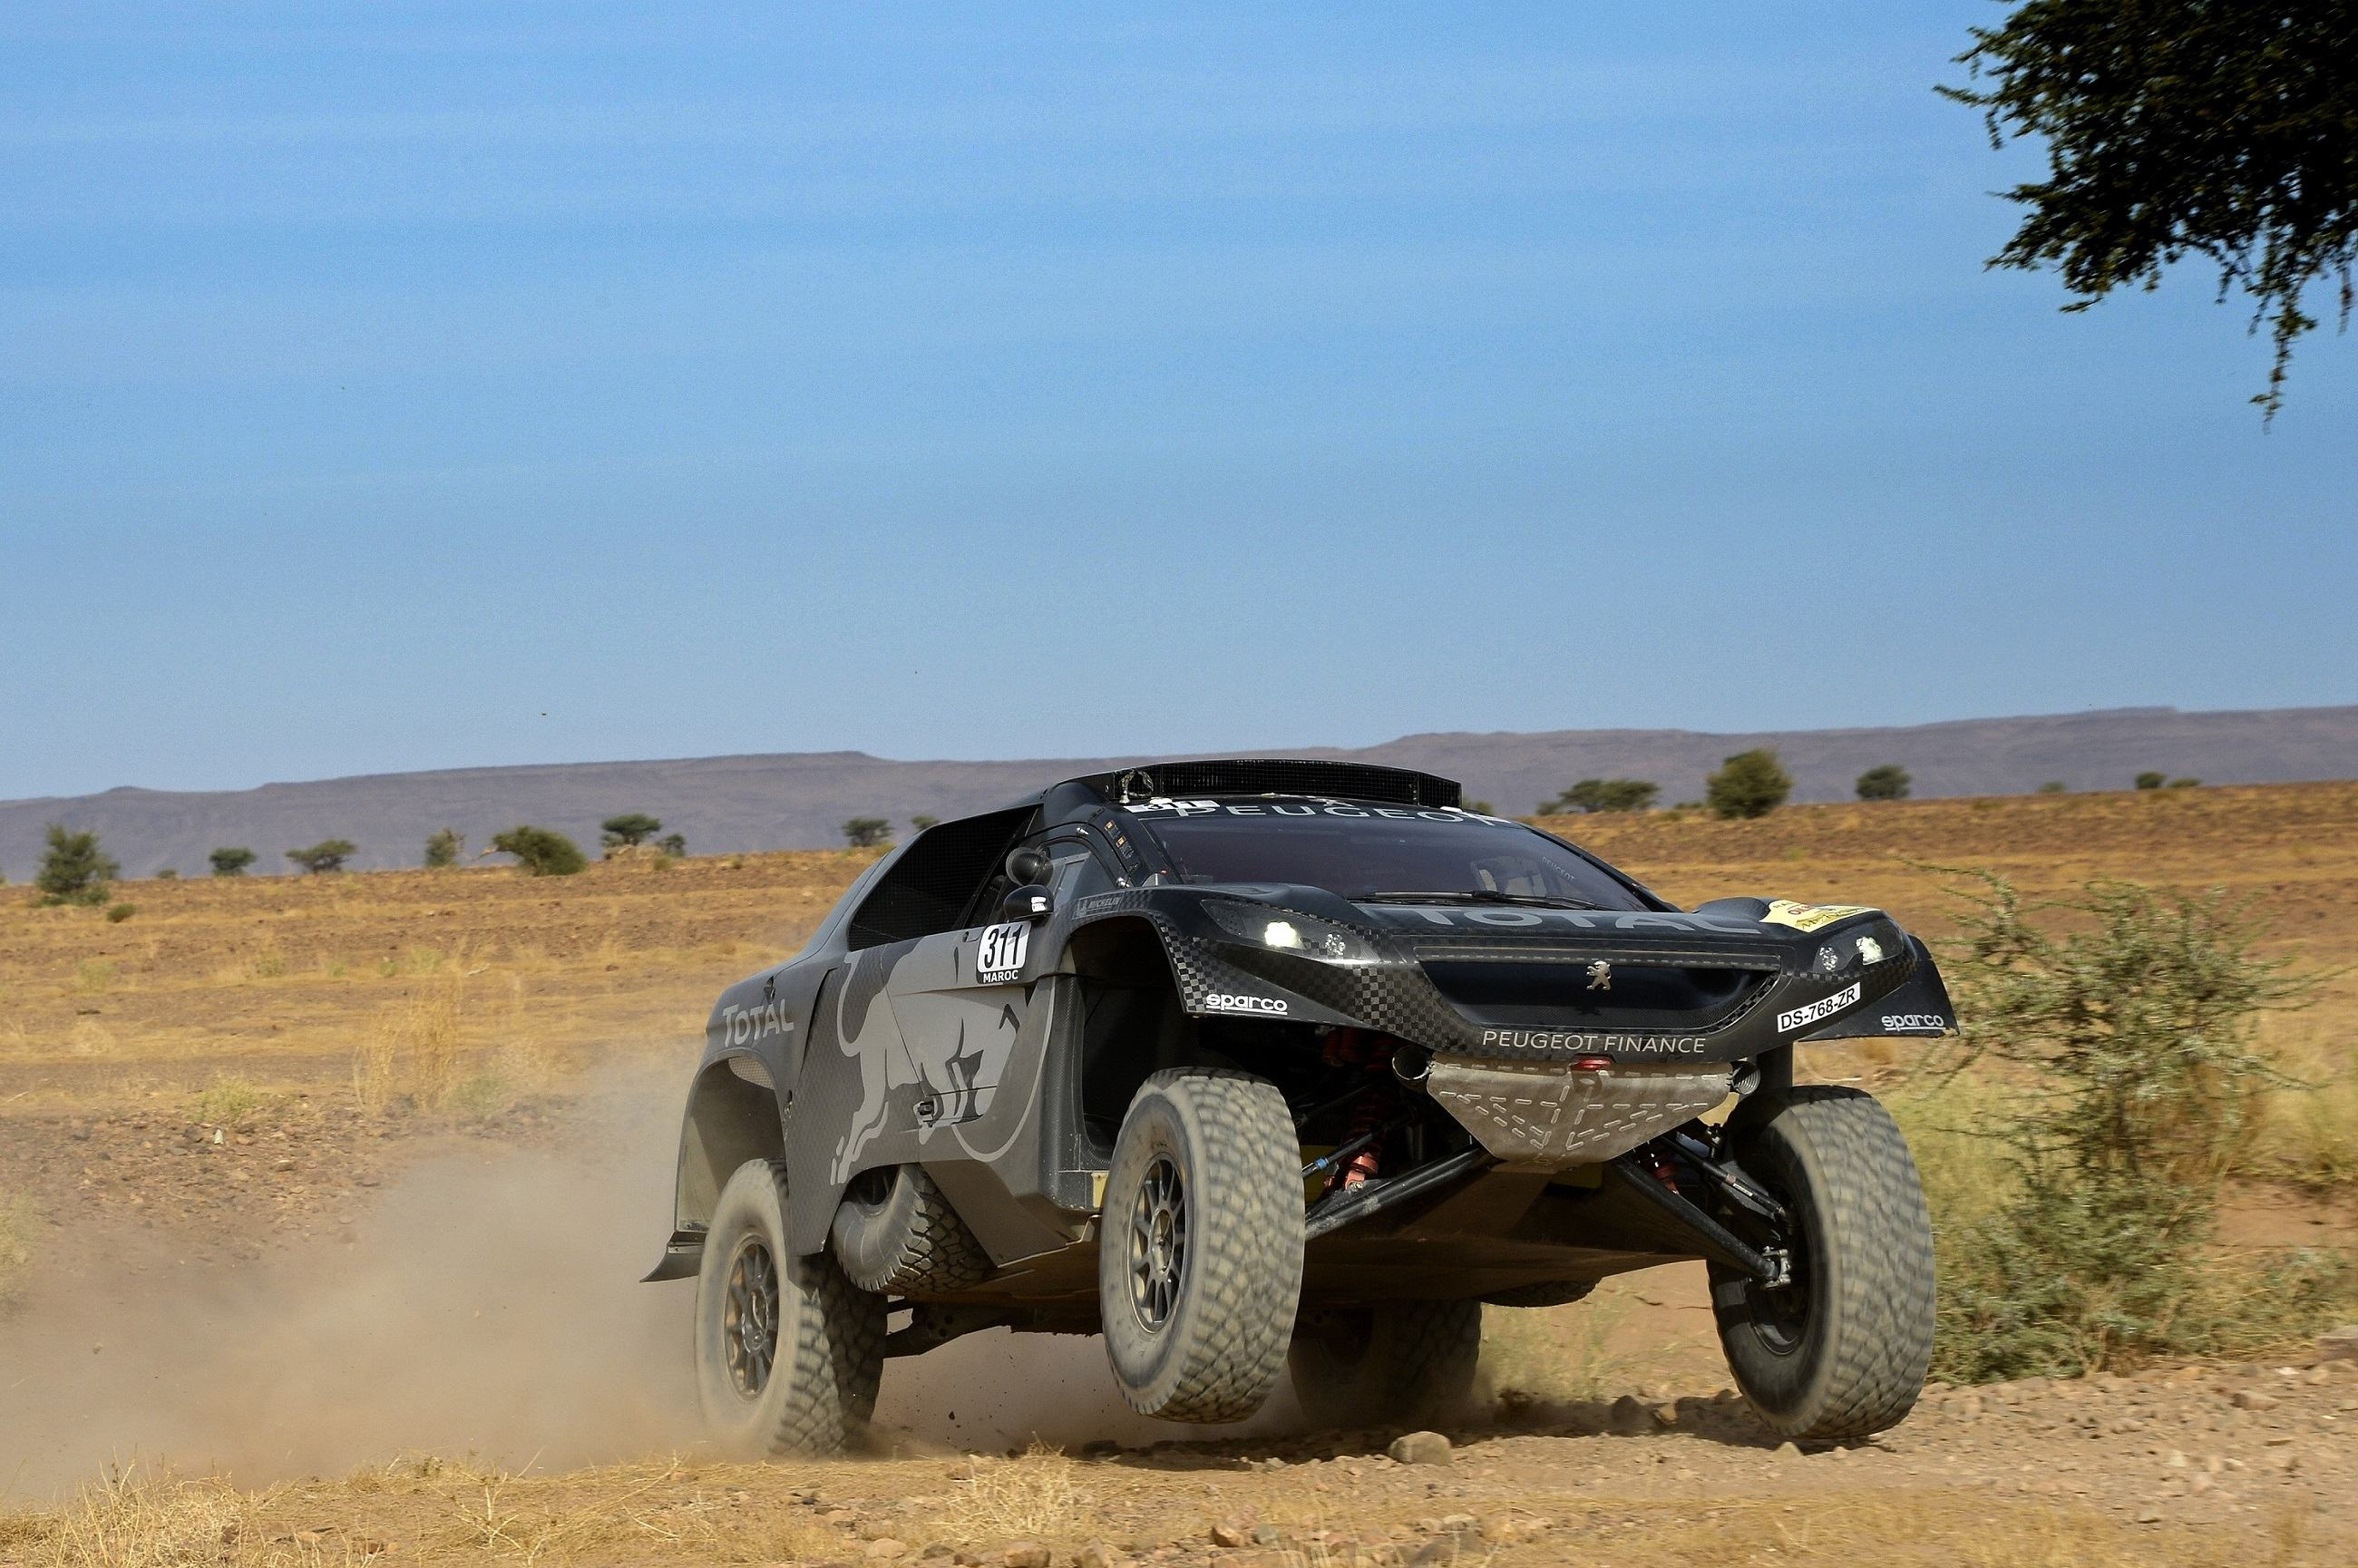 Classement-Etape-2-Rallye-Maroc-2015